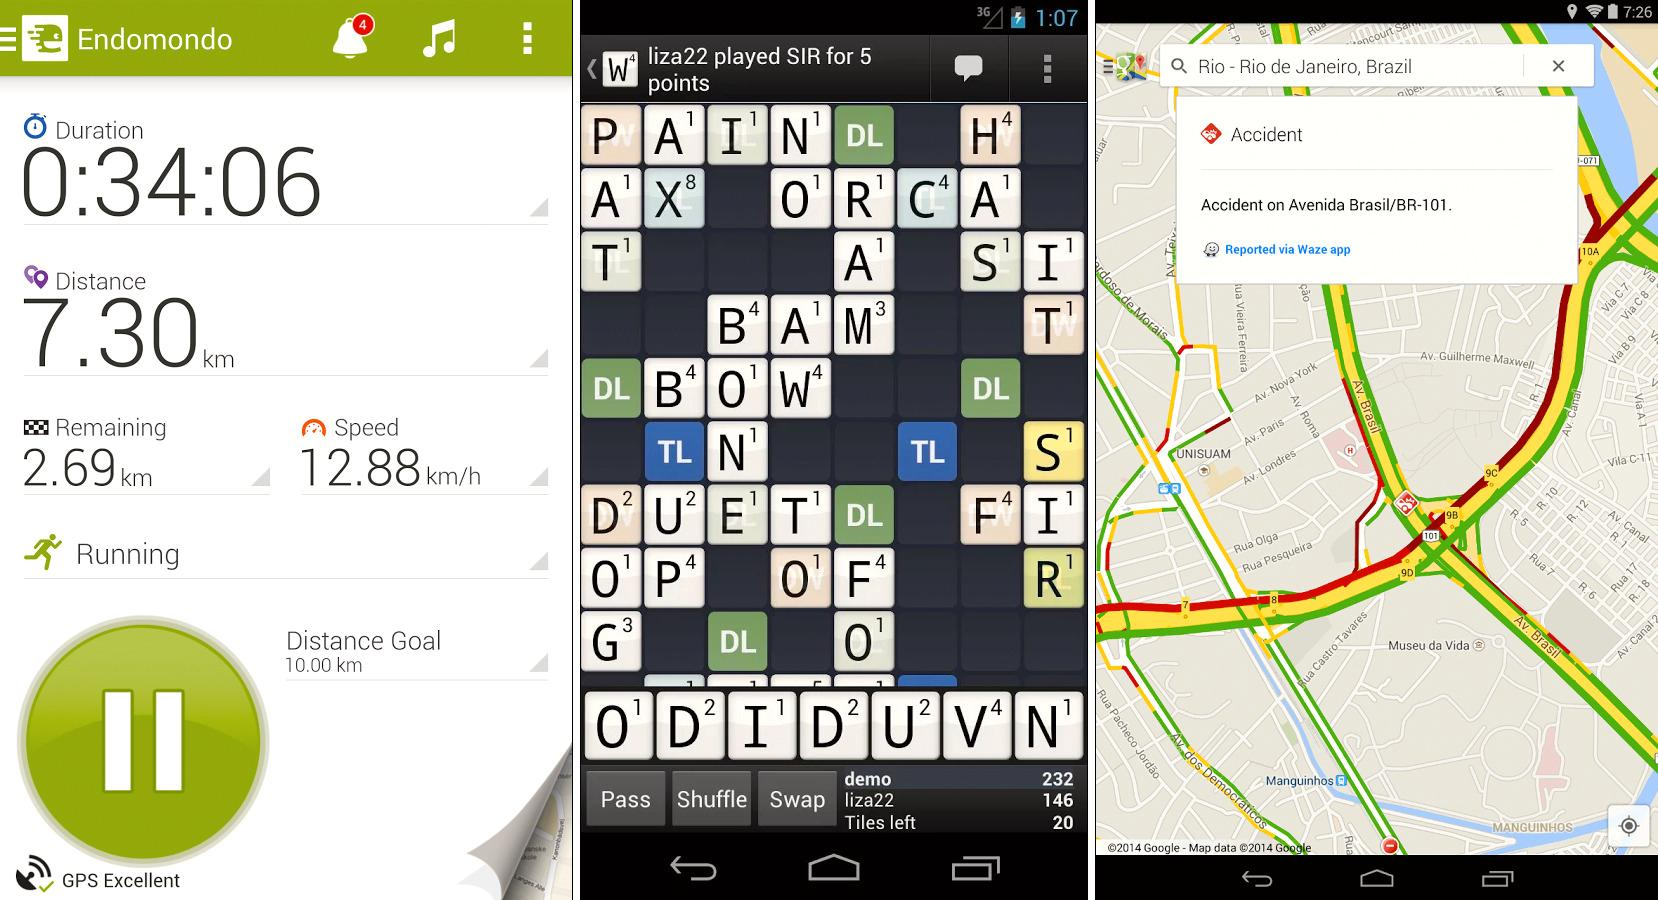 Varogs favoritter: Endomondo, Wordfeud og Google Maps. .